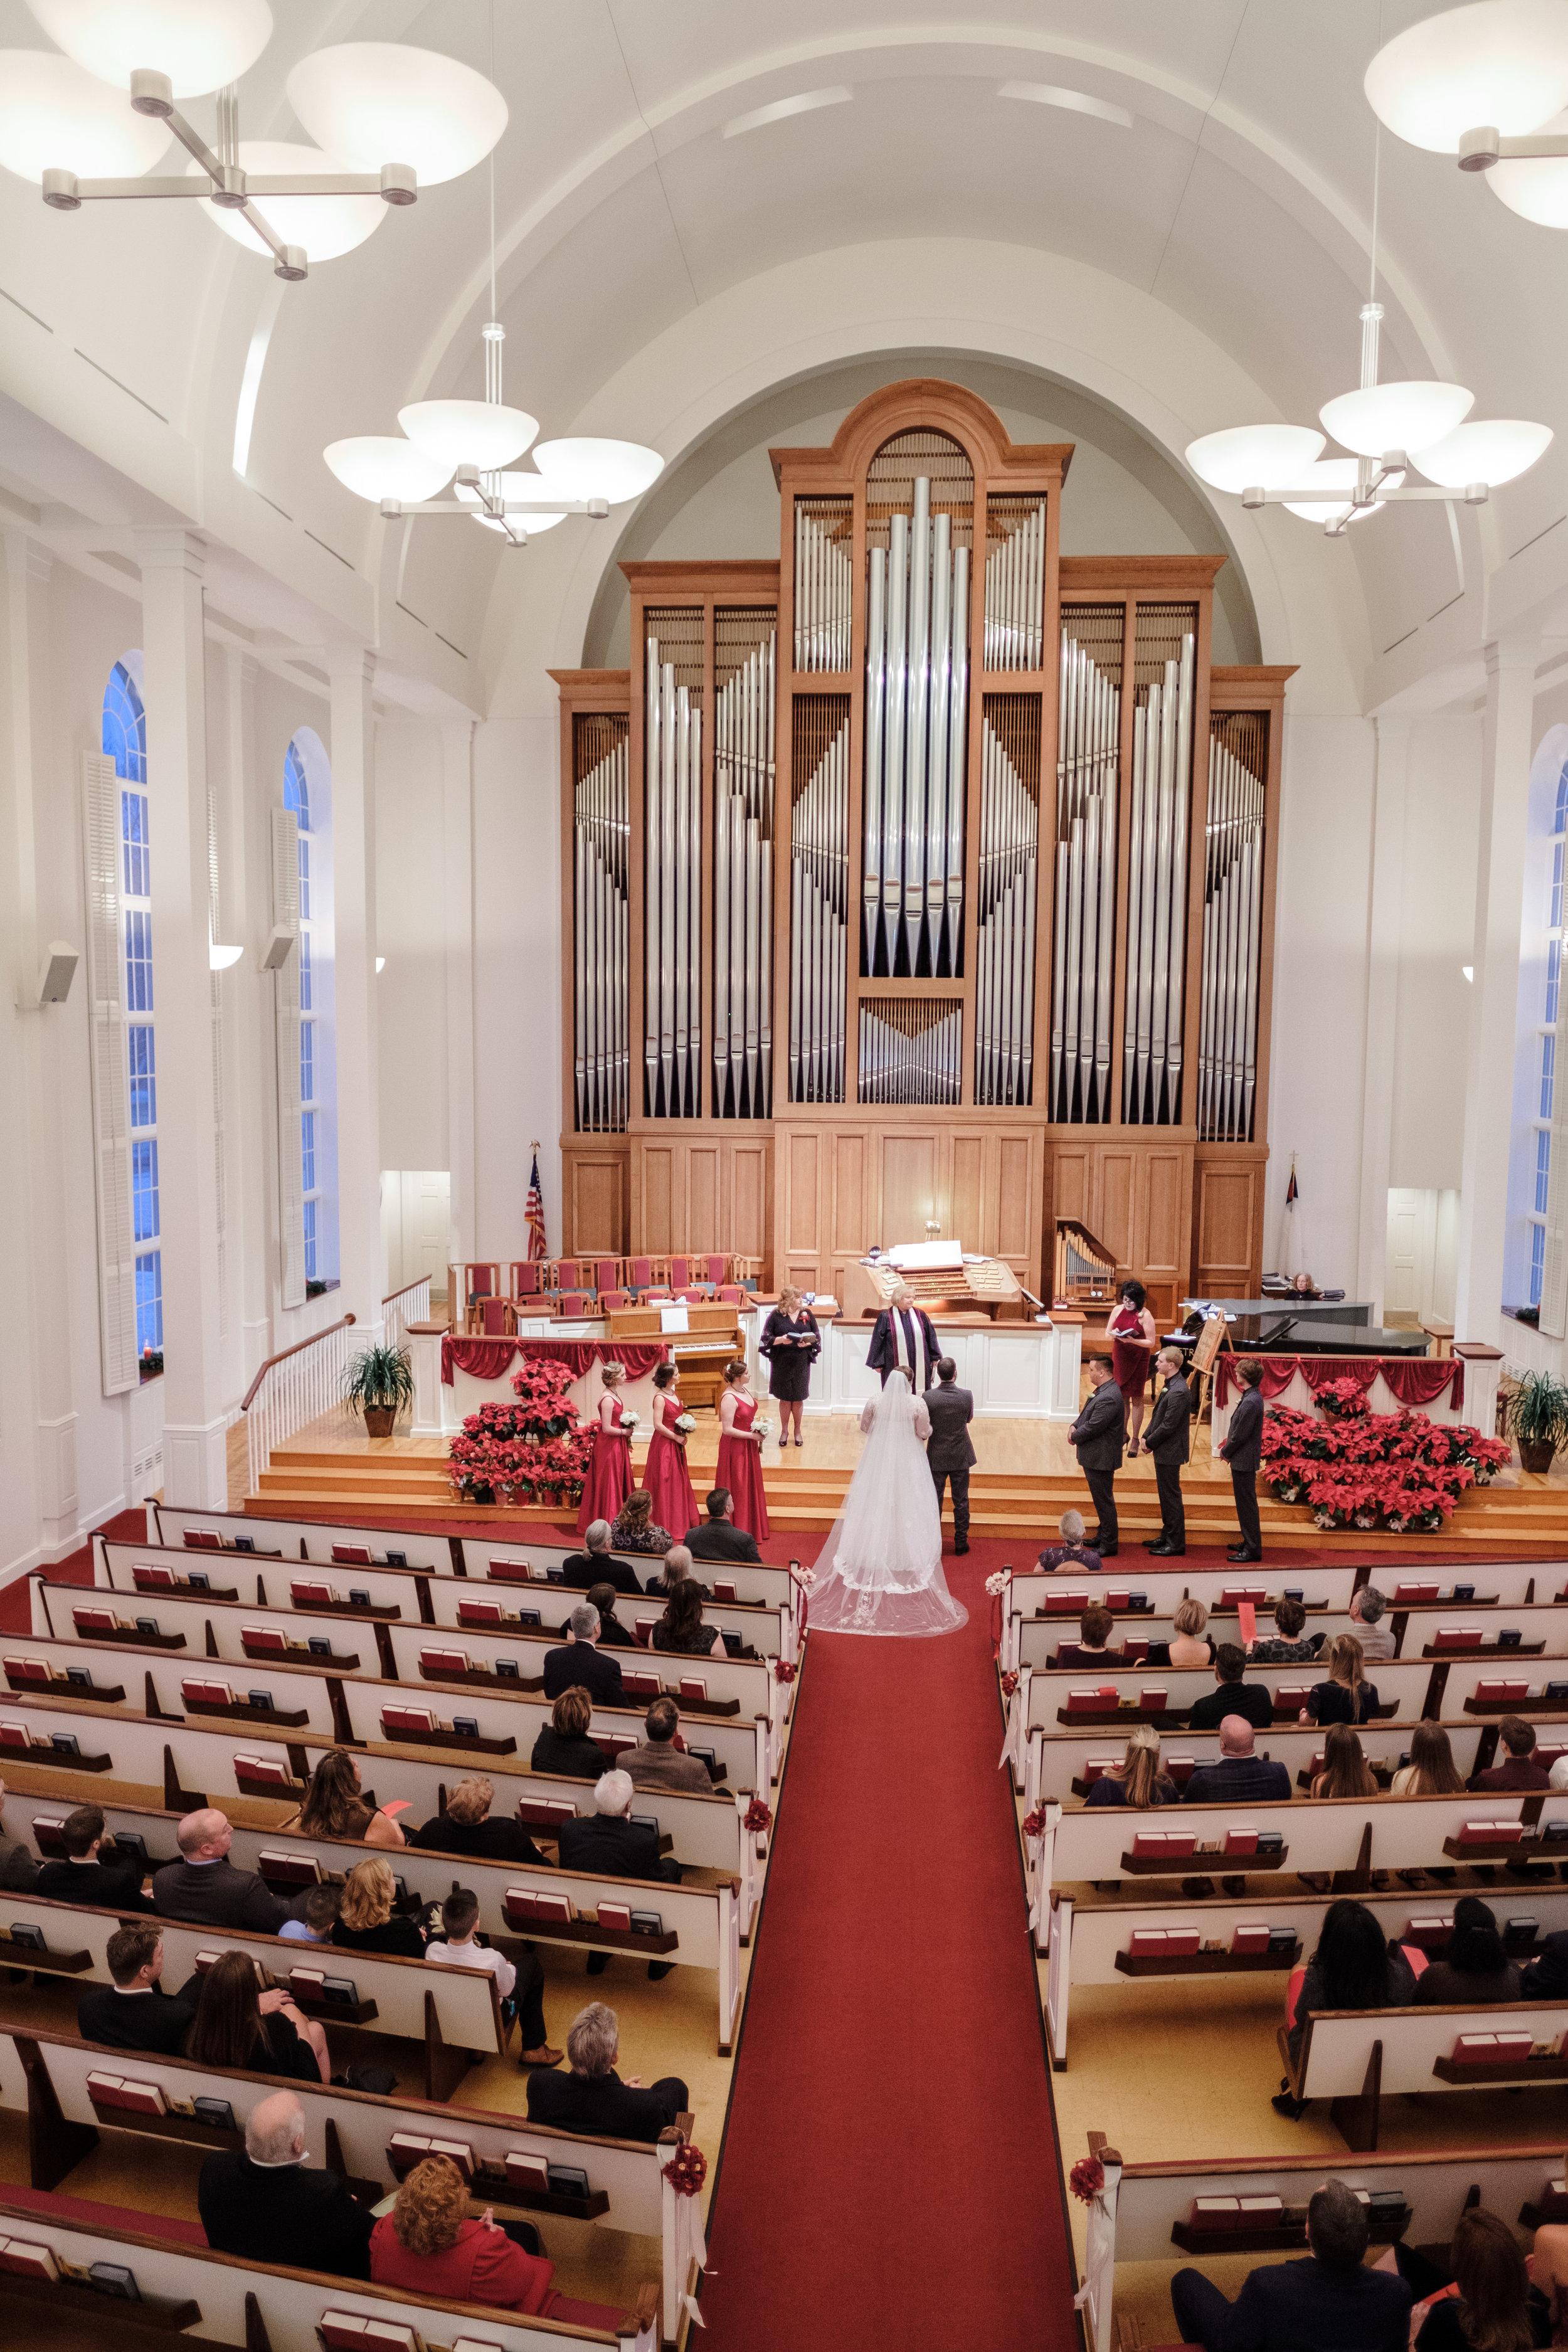 18-12-28 Corinne-Henry-Pavilion-Wedding-277.jpg